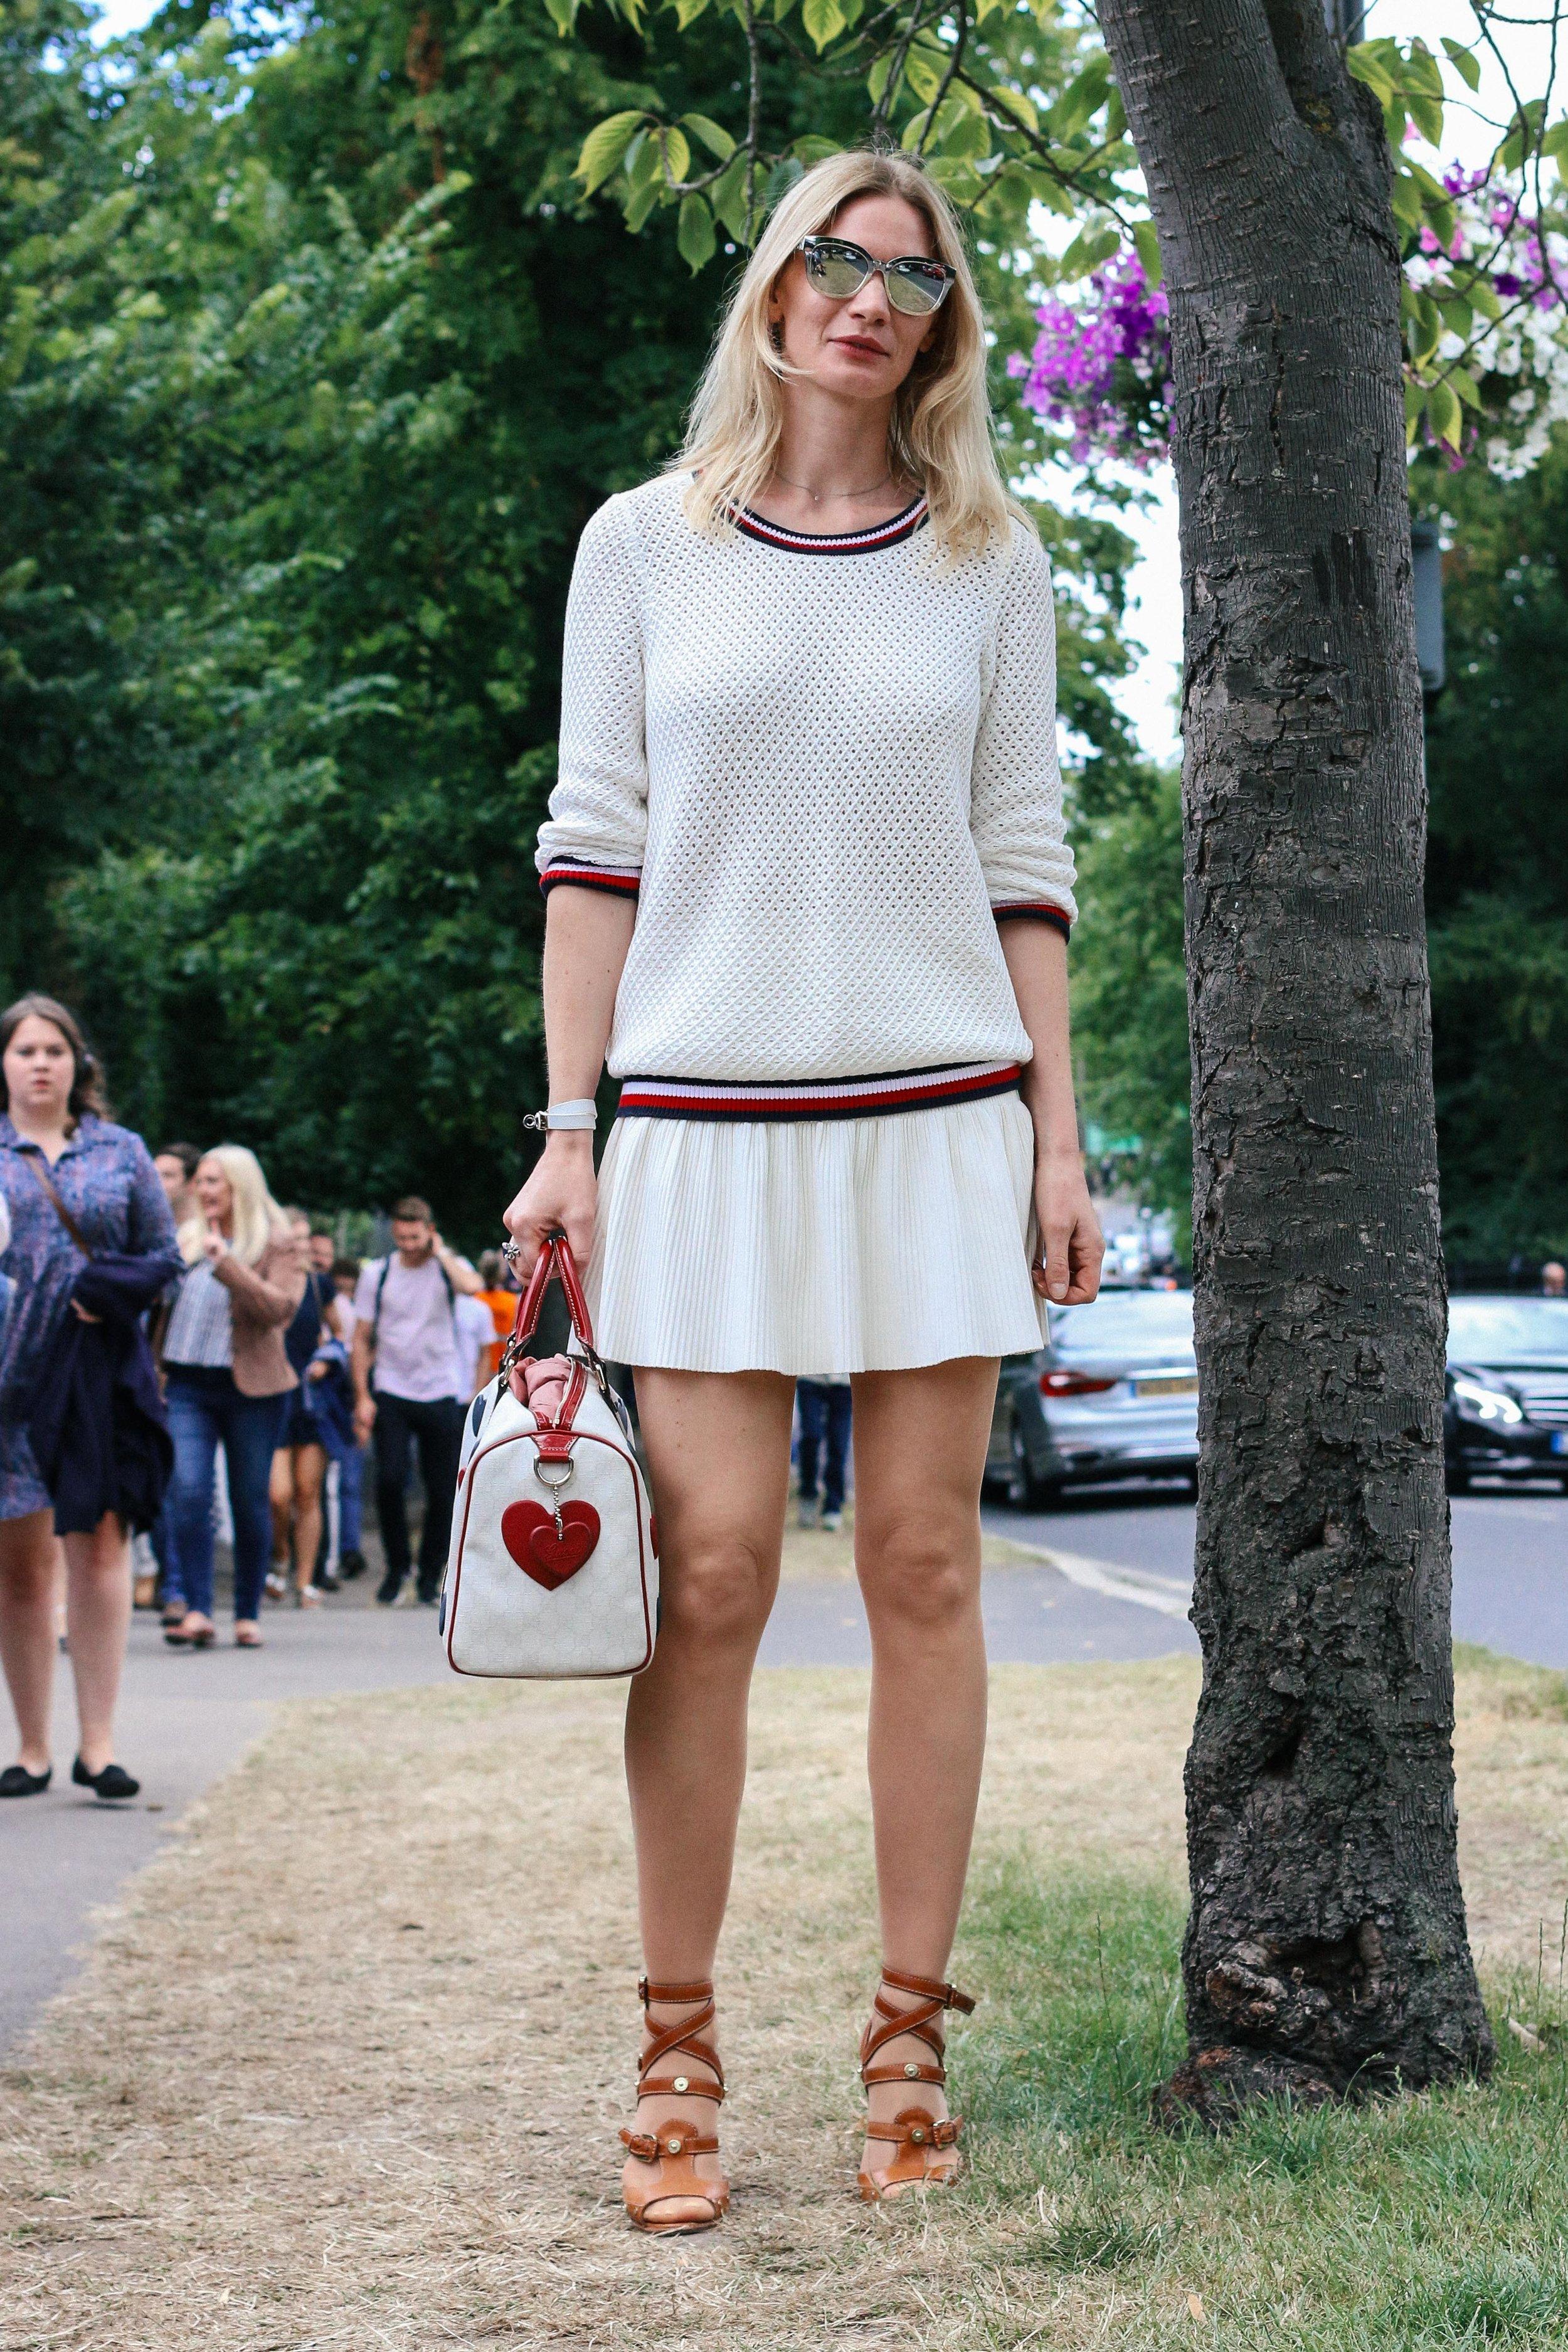 Street fashion stories_Imaginealady_wimbledon_outfit